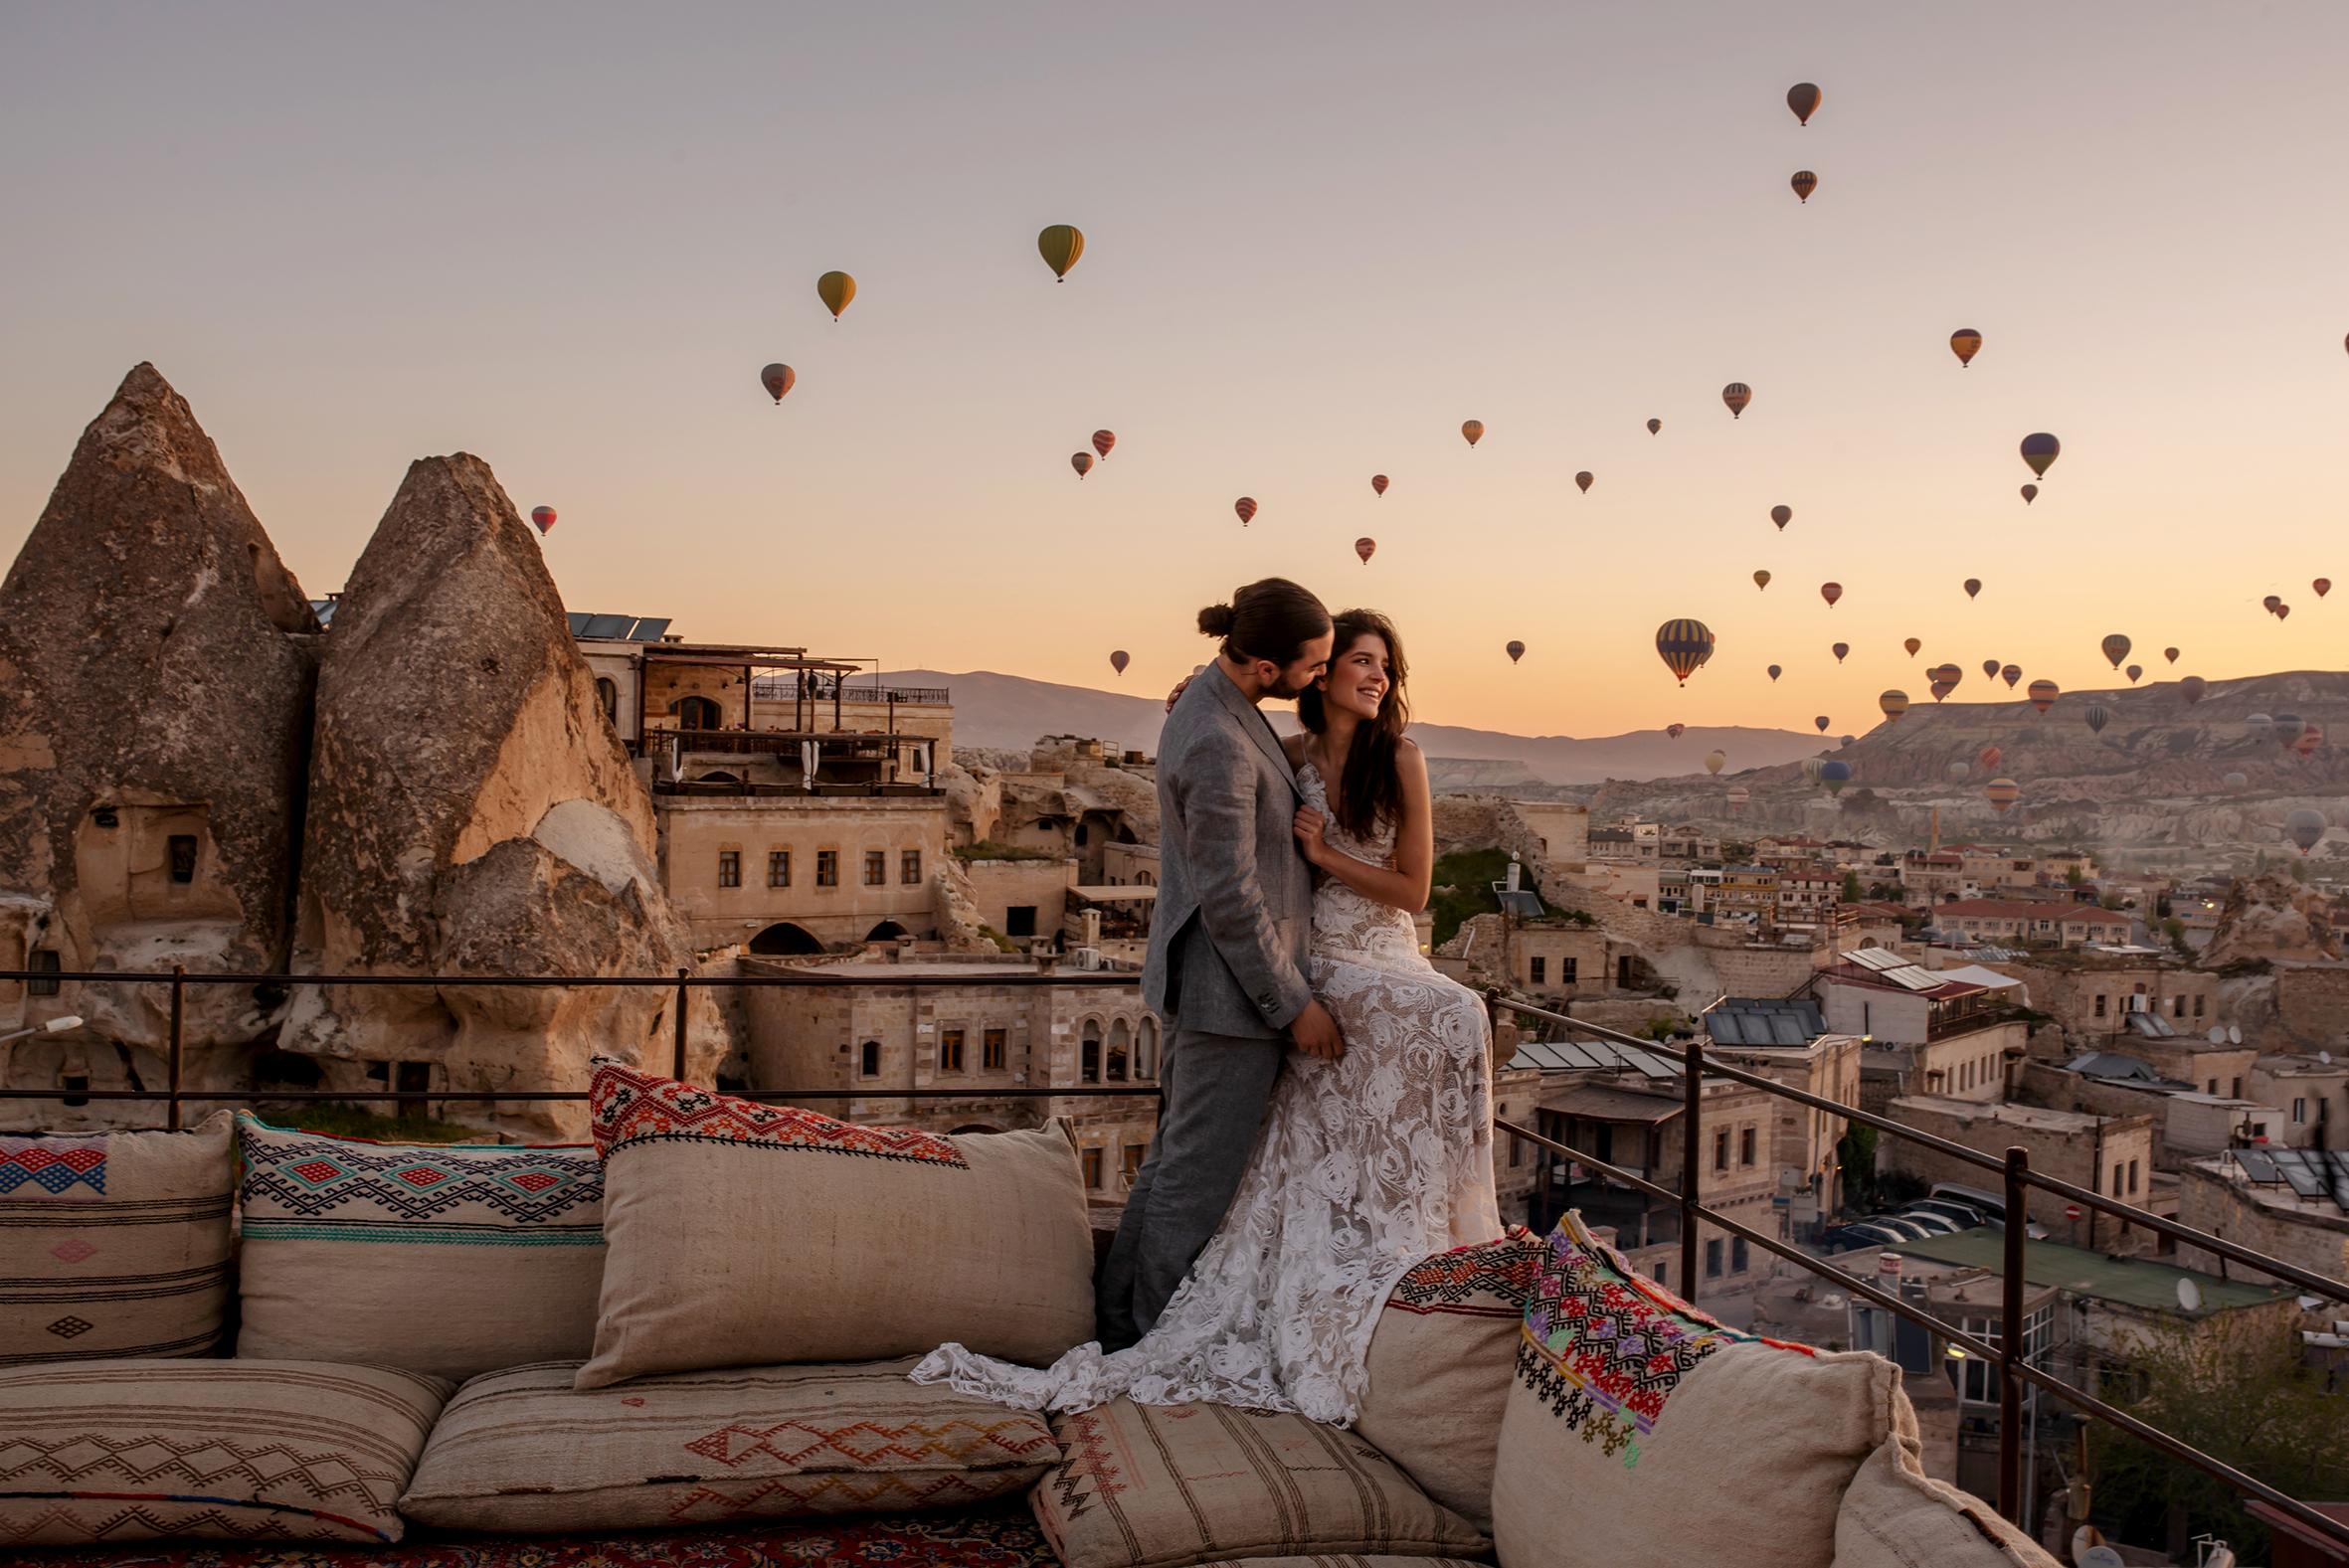 Photography Workshop in Cappadocia